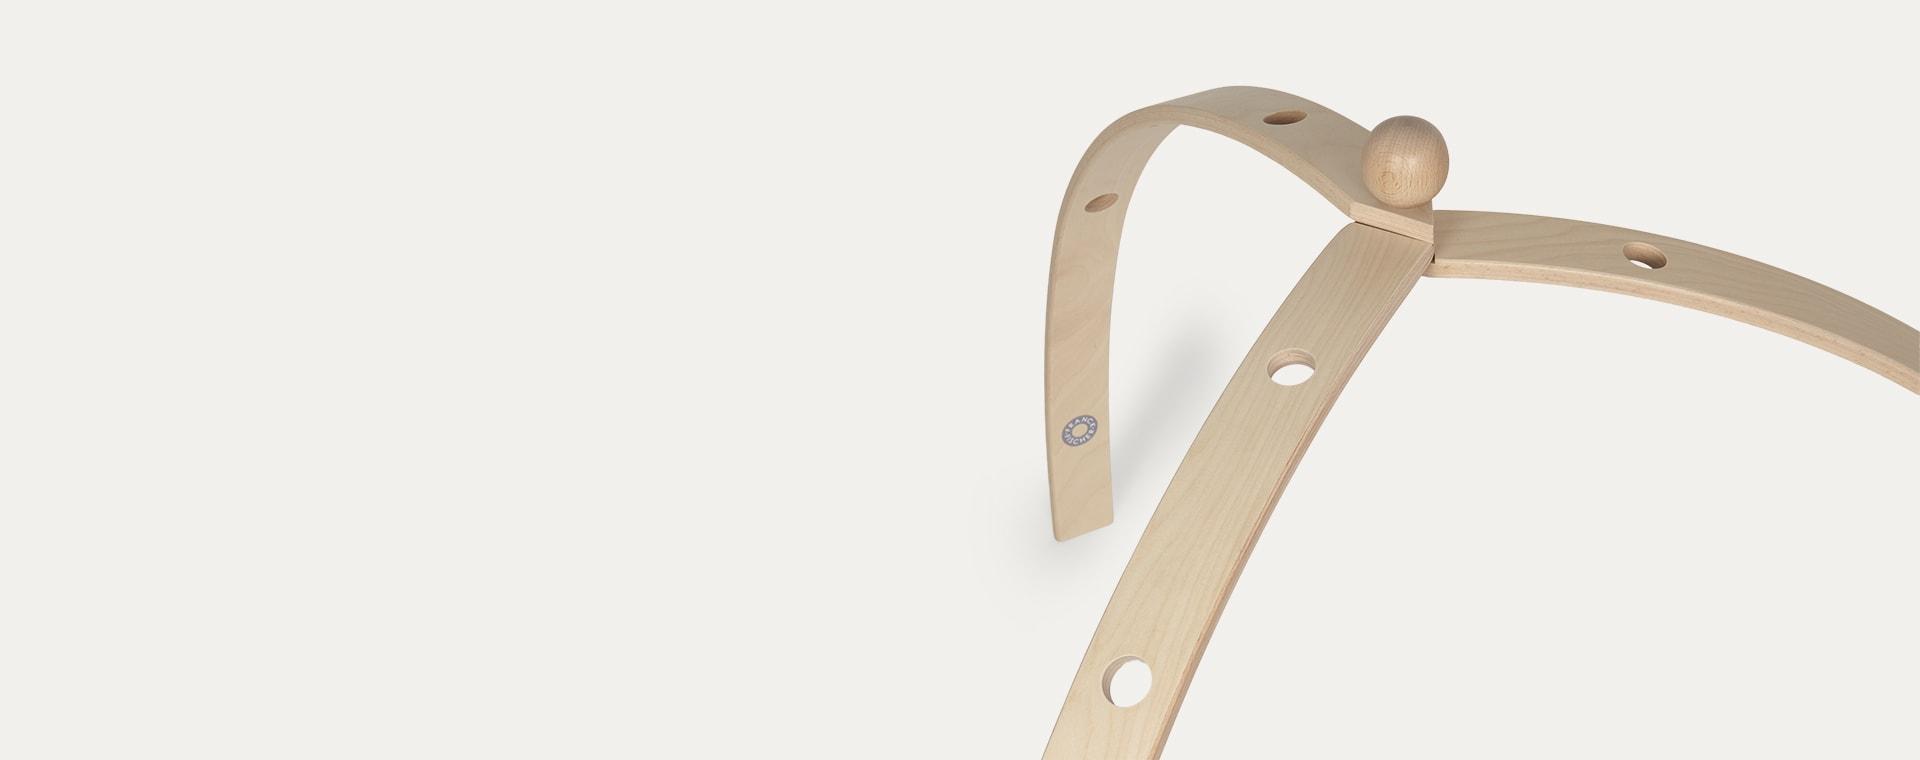 Neutral Franck & Fischer Foldable Play Gym